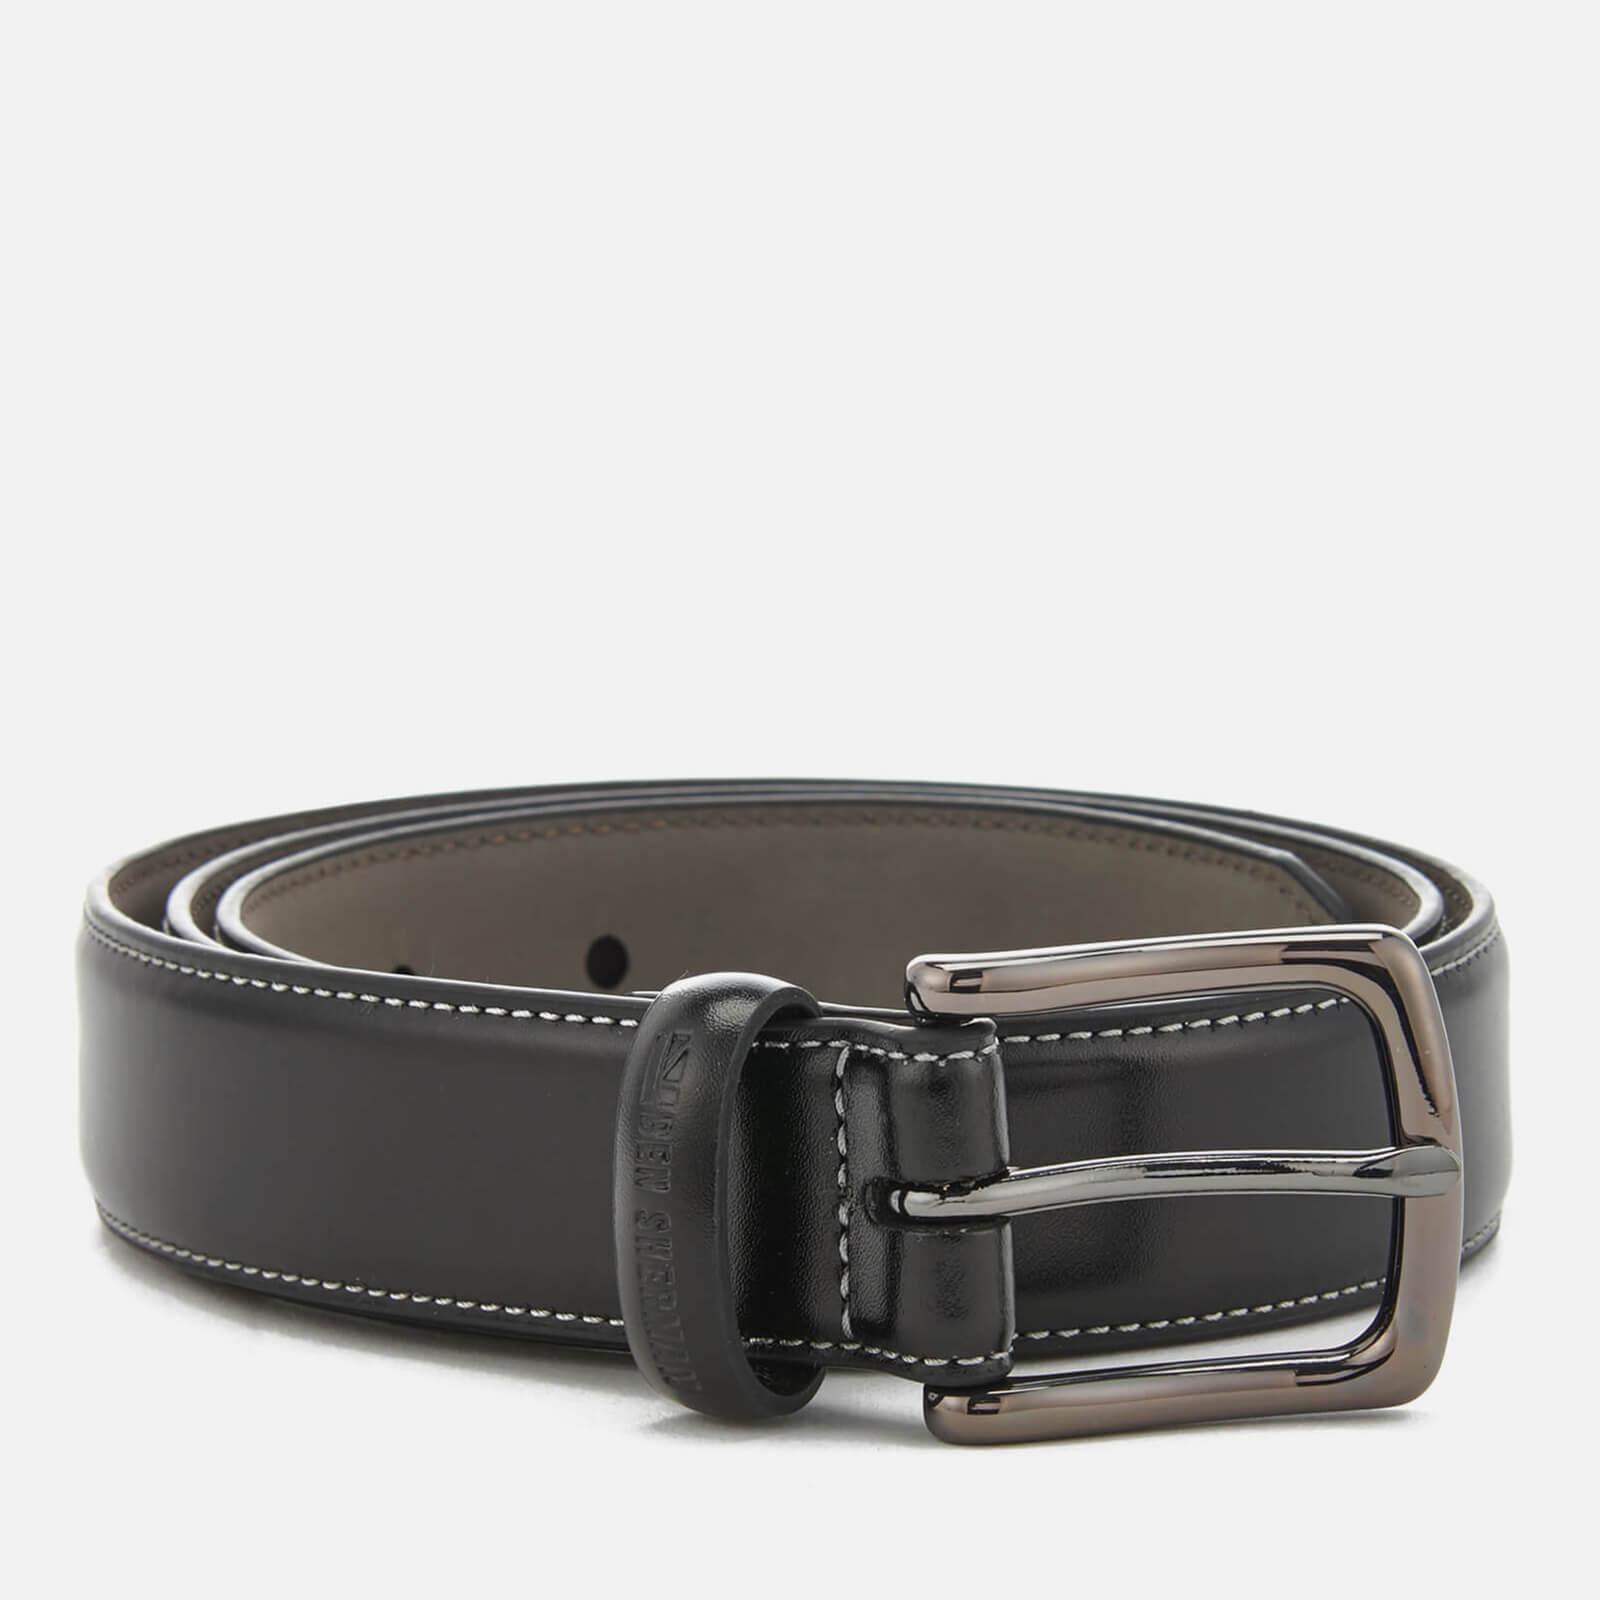 facaa748028a Ben Sherman Men's Leather Vauxhall Belt - Black/Grey Mens ...